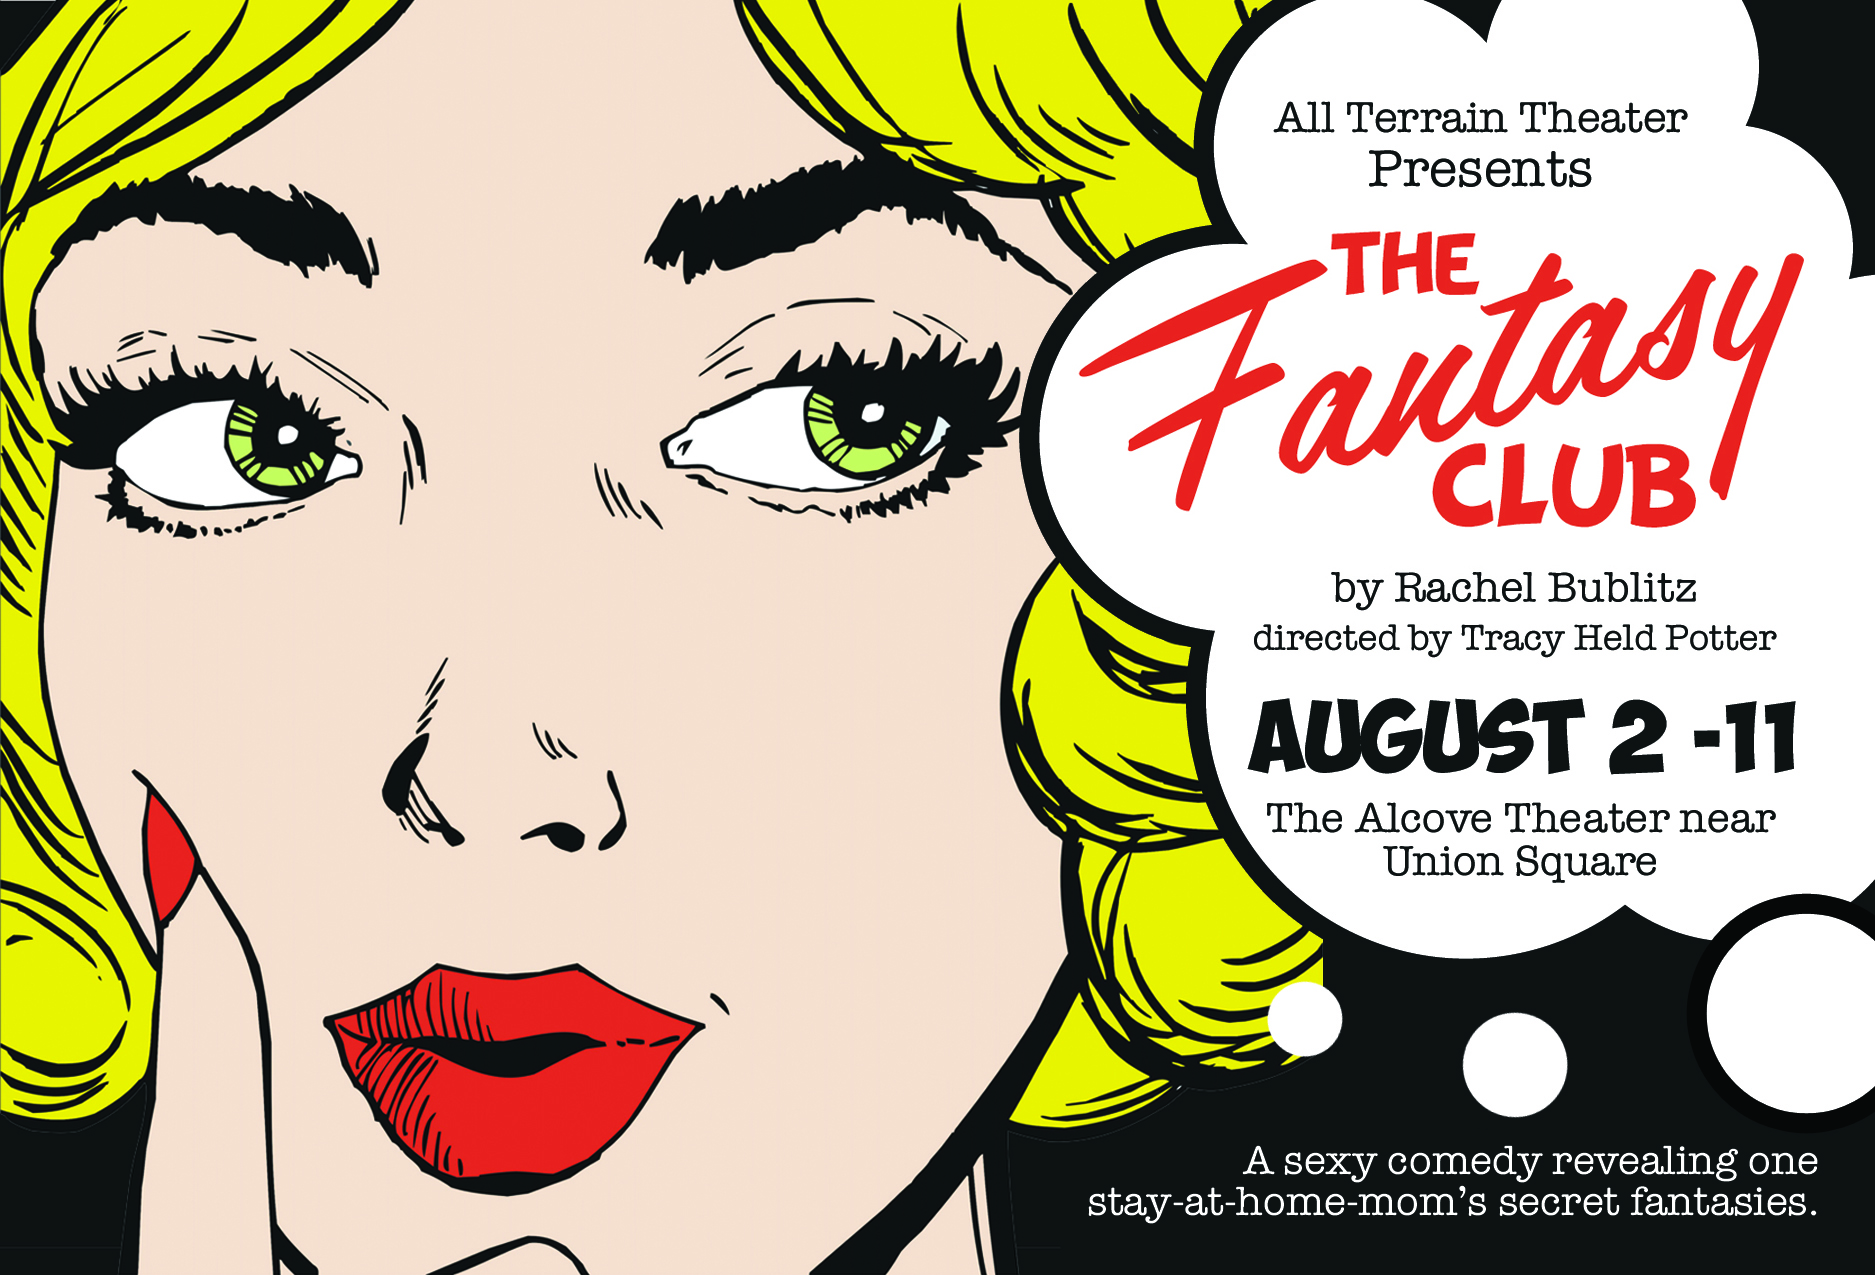 Postcard for THE FANTASY CLUB.